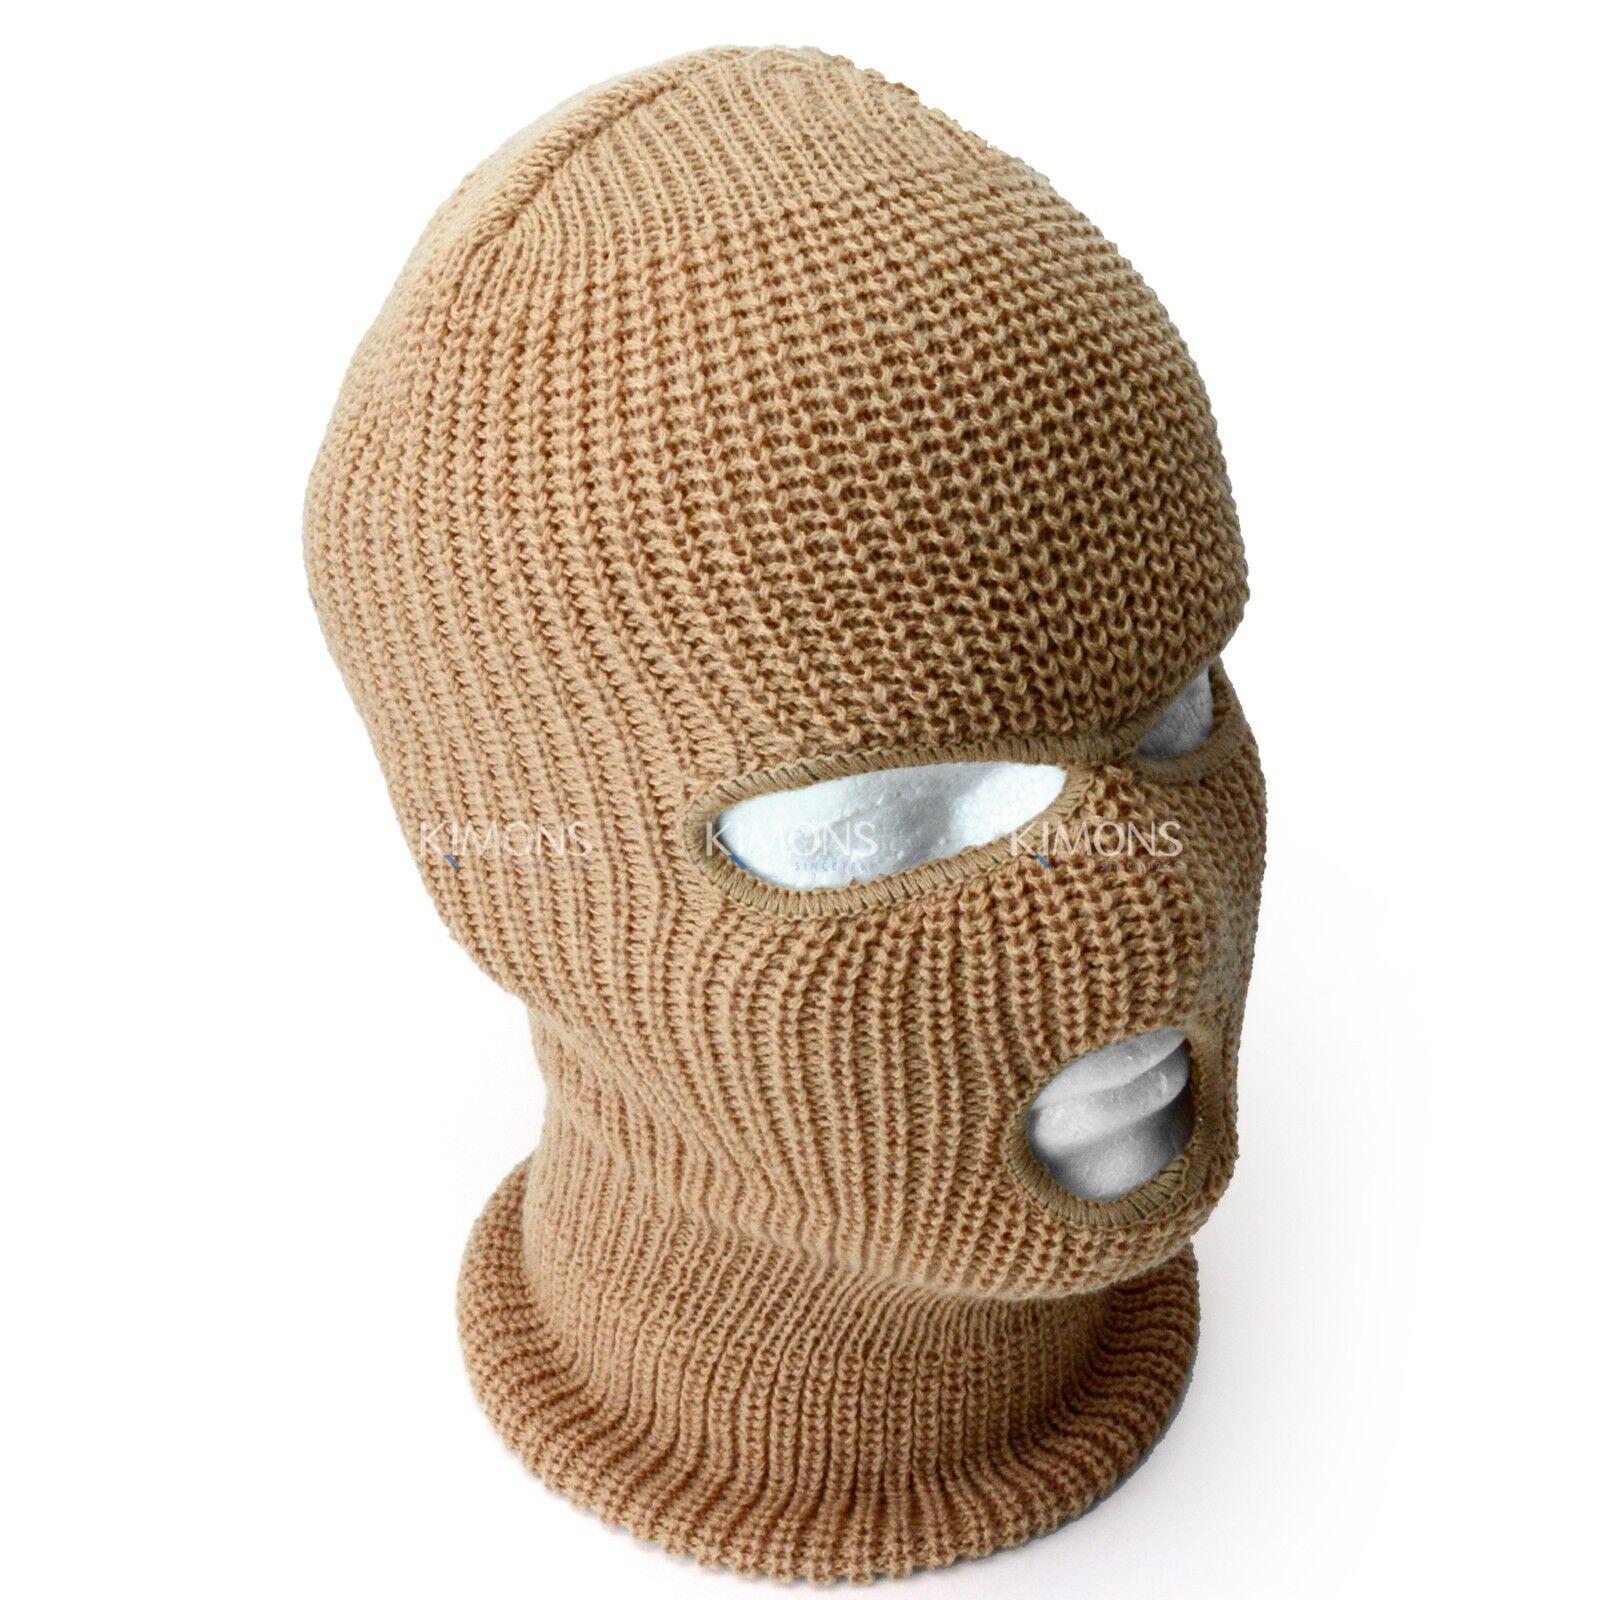 a4dd3a62506 3 Hole Ski Mask Full Face Winter Cap Balaclava Hood Army Tactical Mask